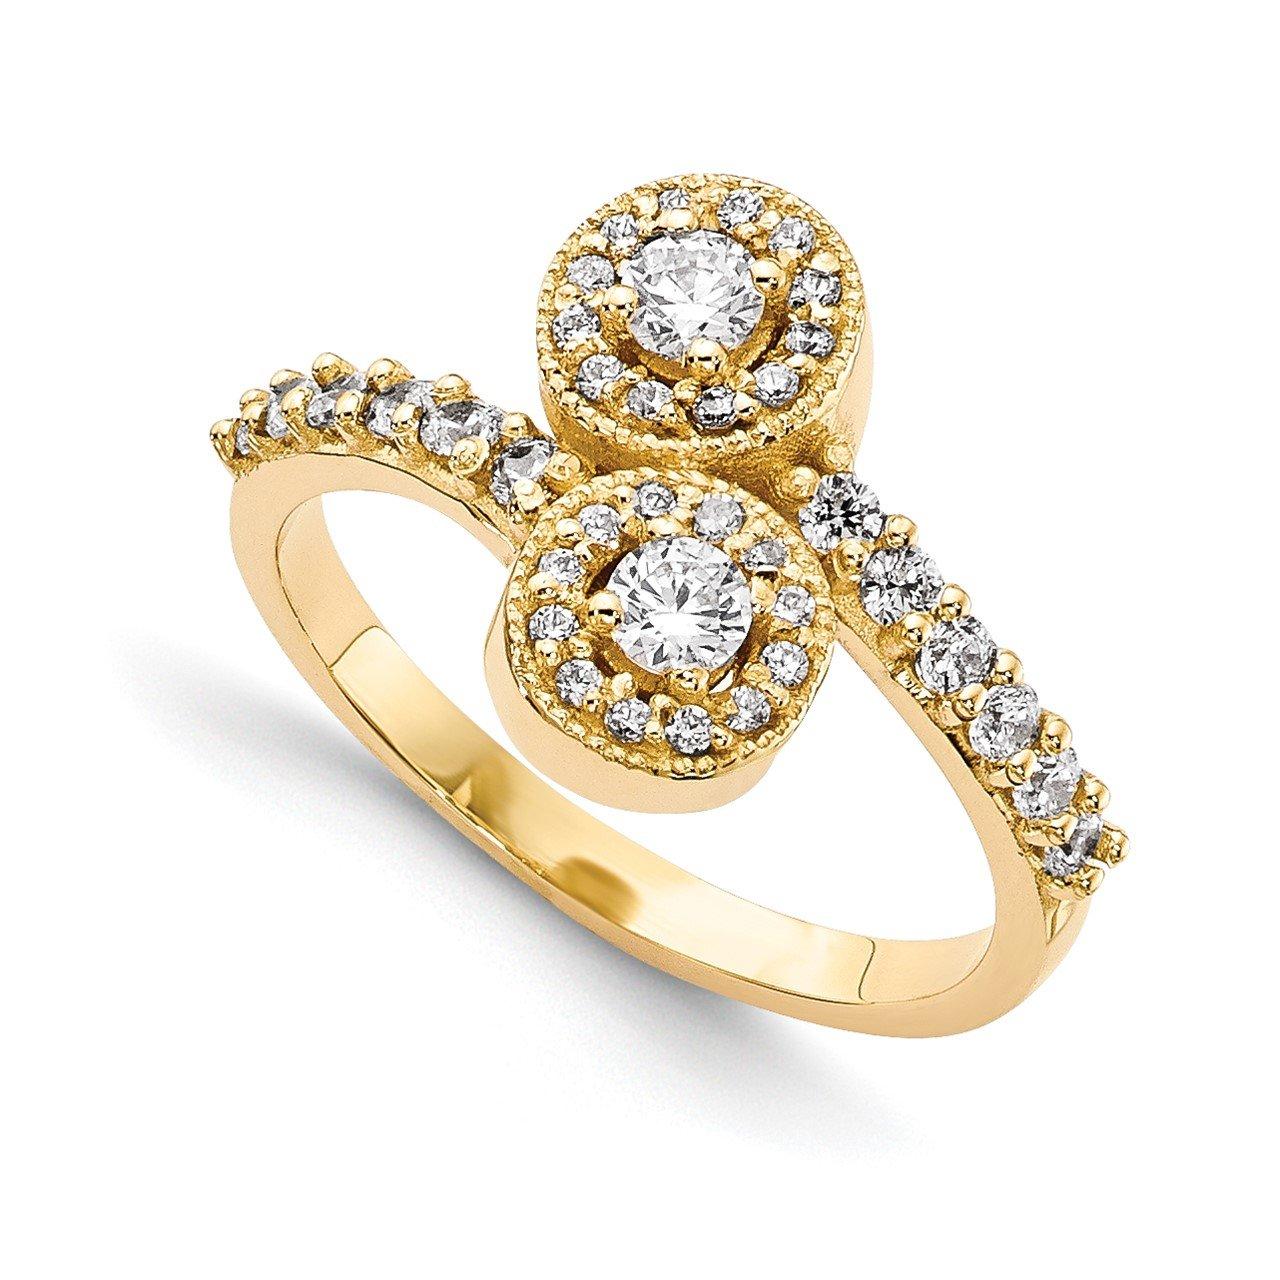 14KY VS Diamond 2-stone Ring Semi-Mount - 3 mm center stones